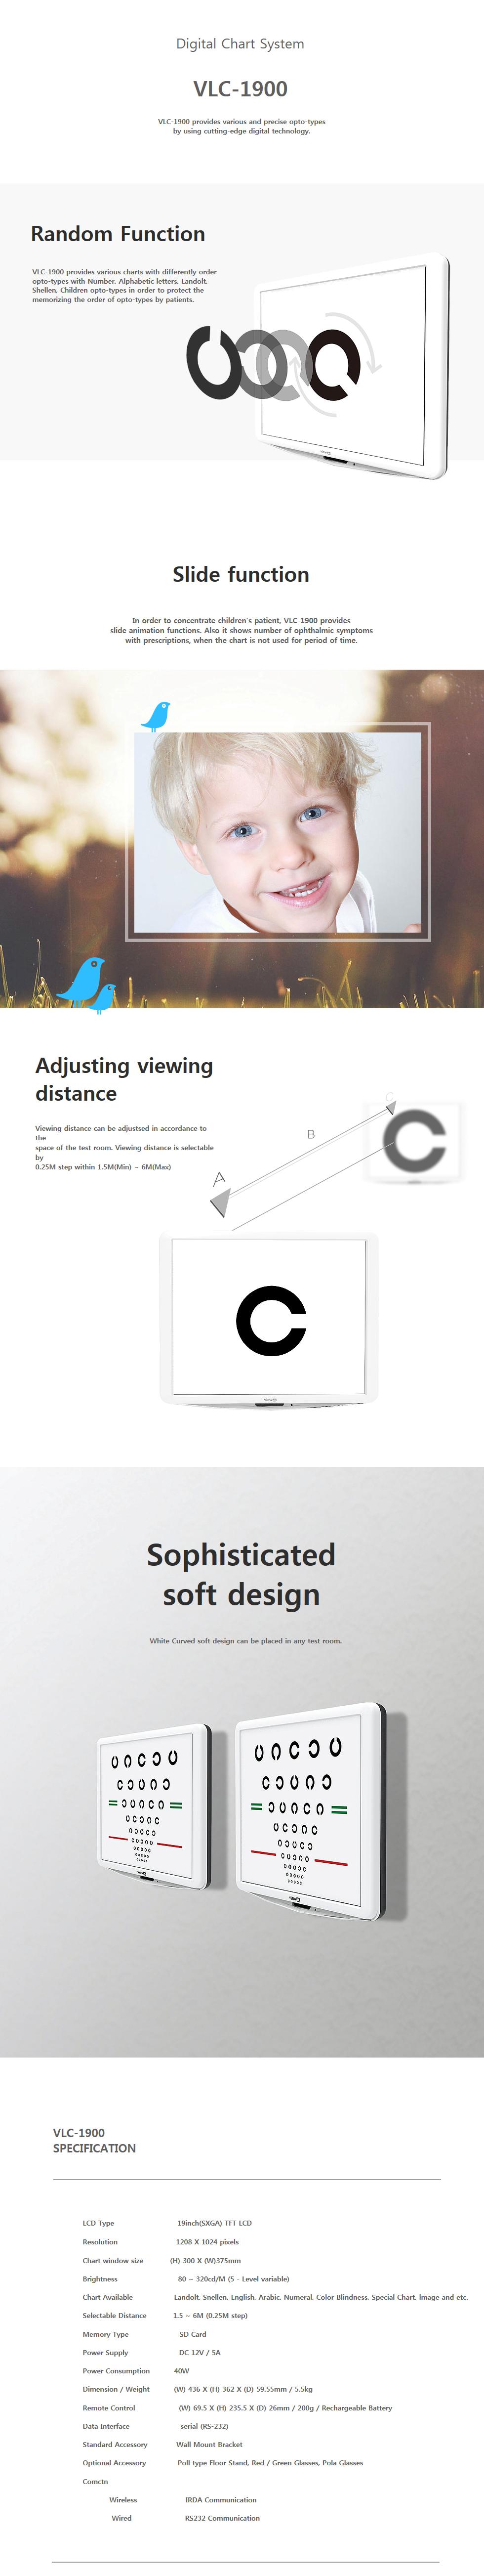 VIEW-M TECH Digital Chart System VLC-1900